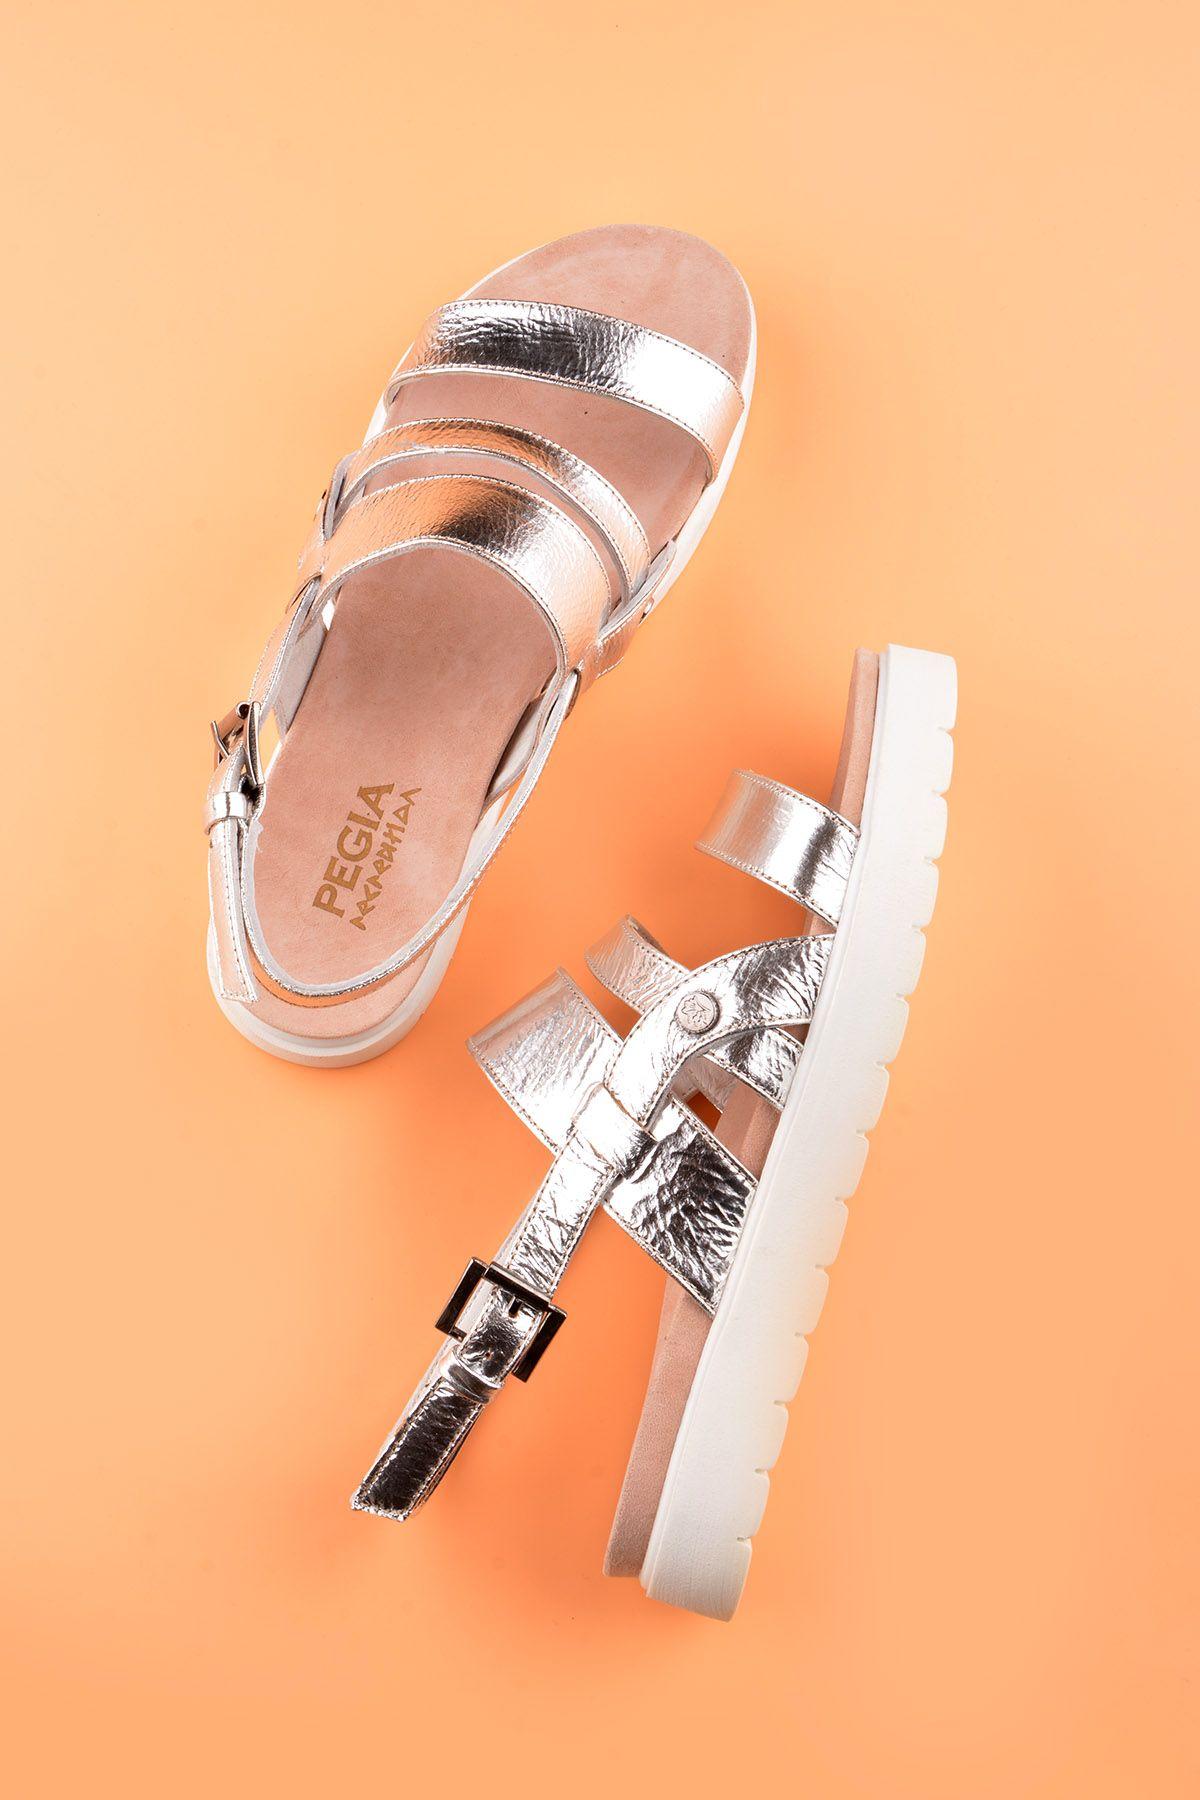 Pegia Gabrielle Hakiki Deri Bayan Sandalet REC-001 Gümüş